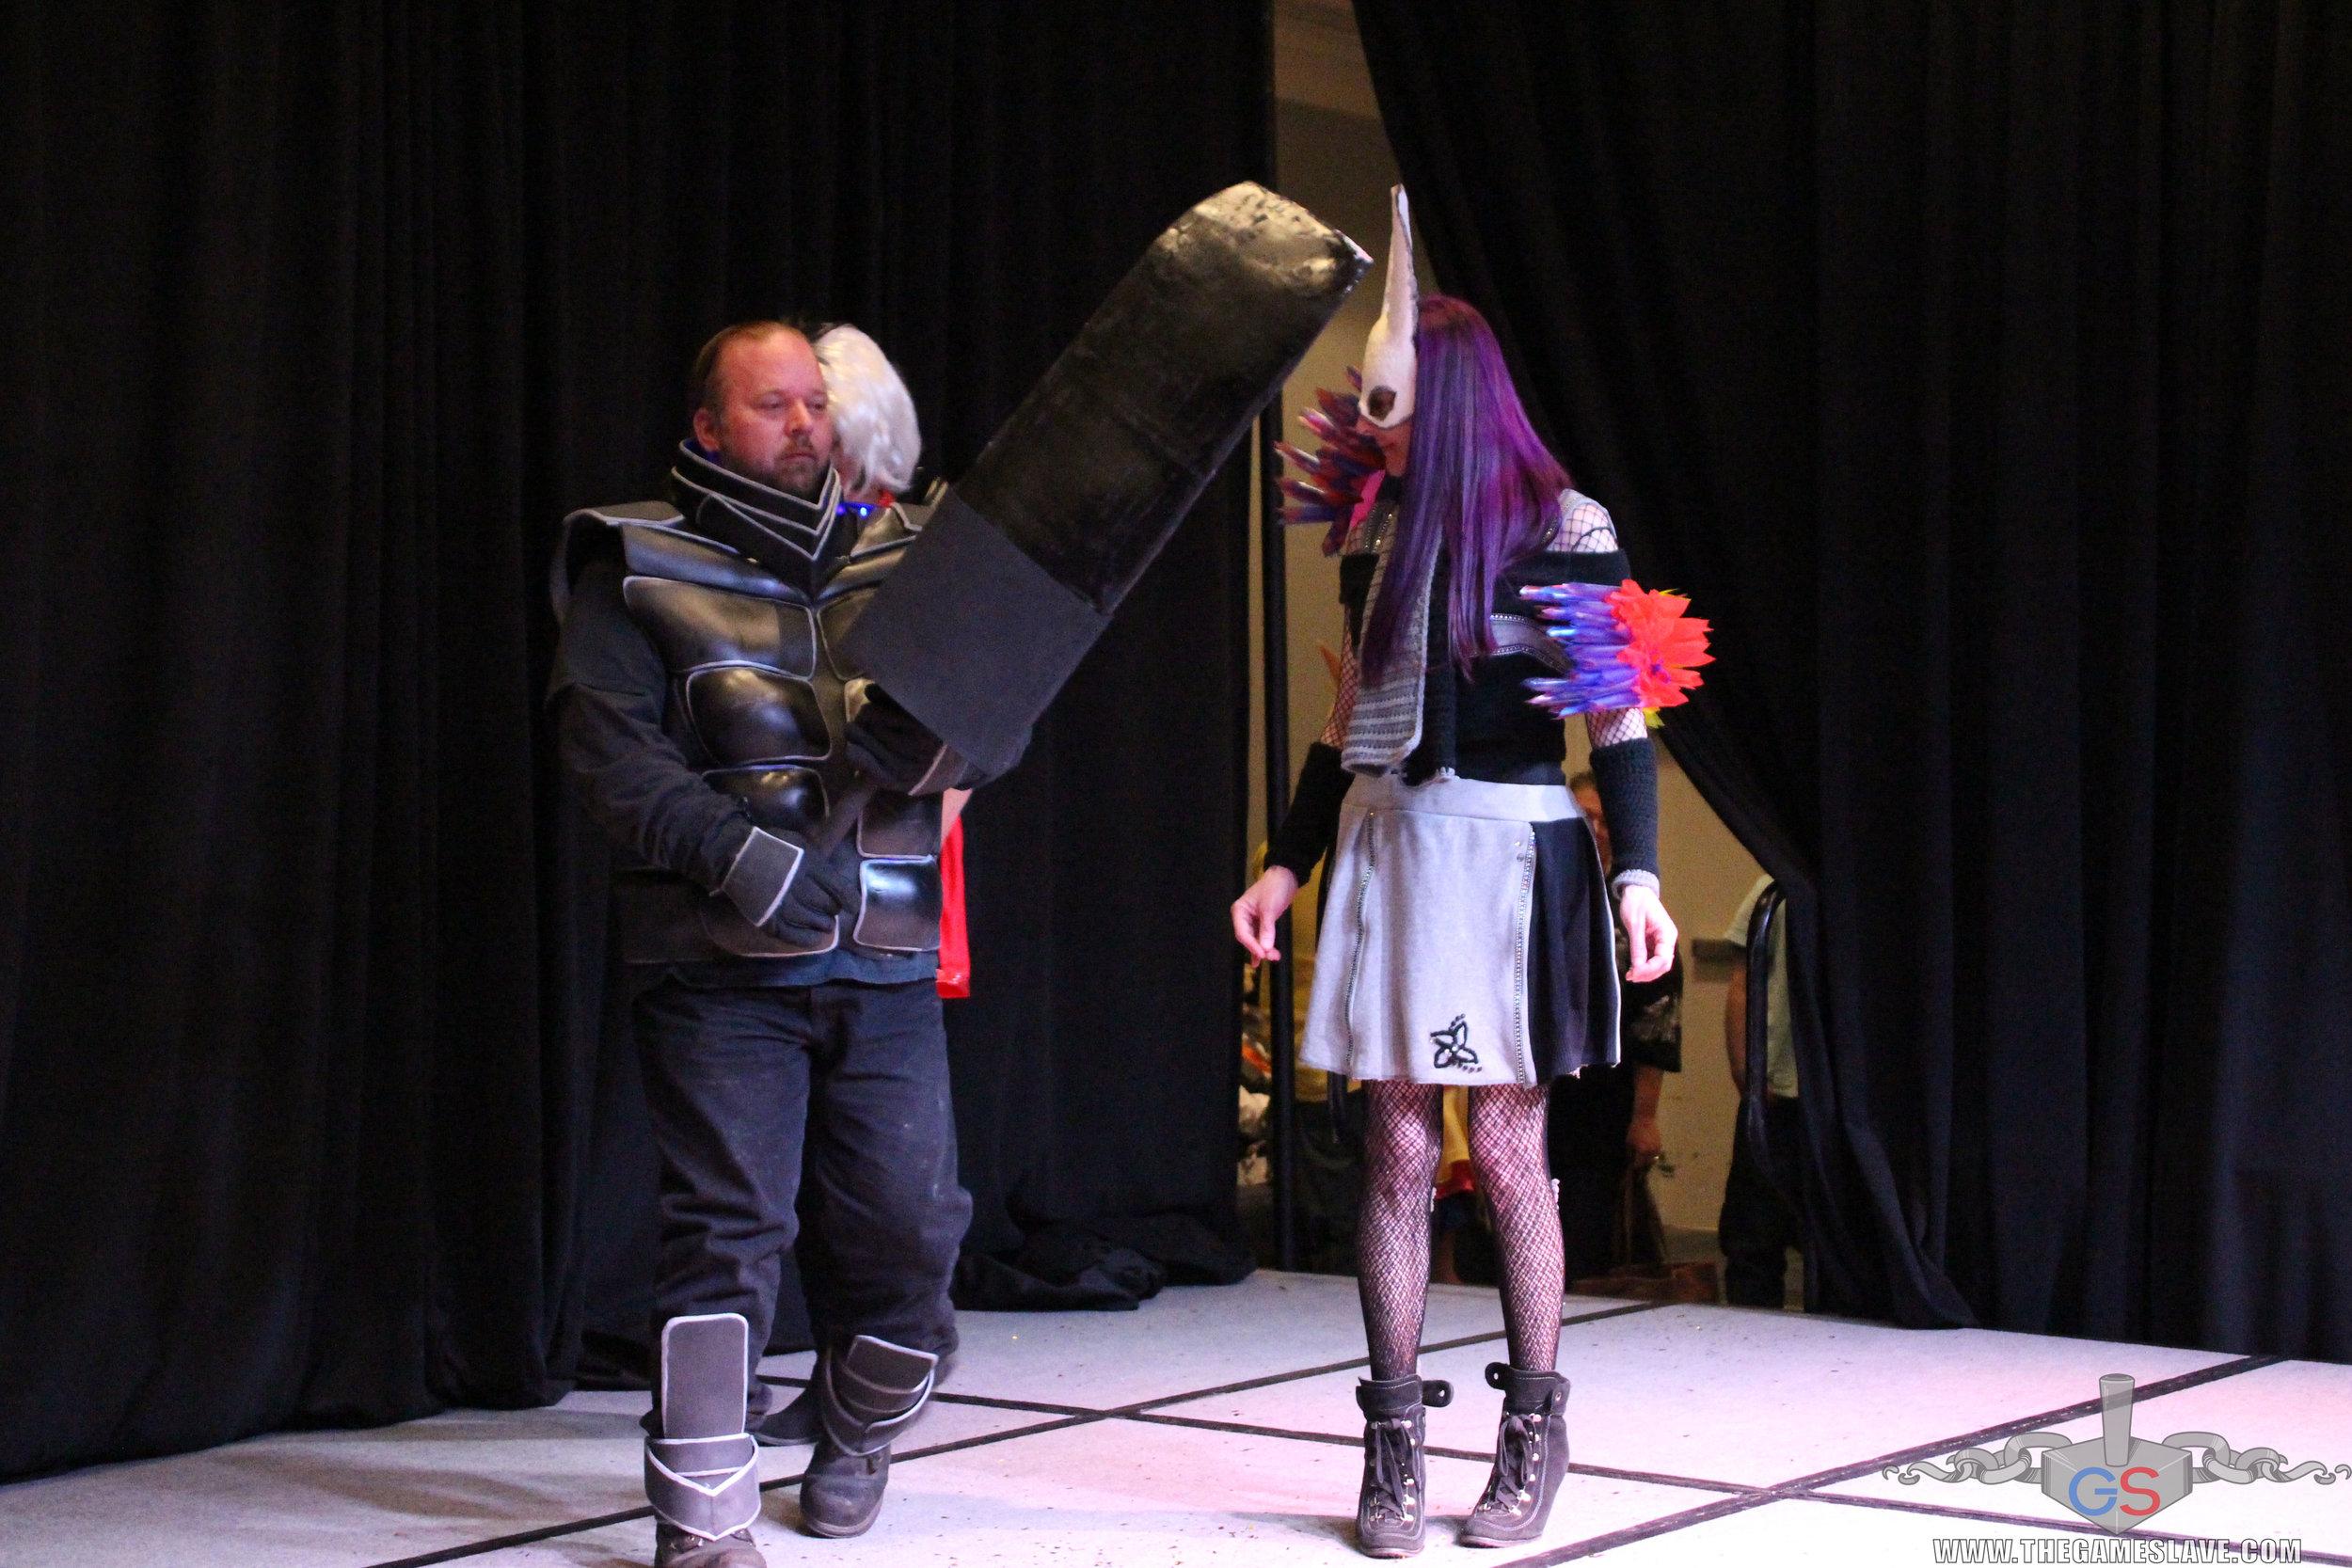 COAF 2019 Costume Contest-189.jpg